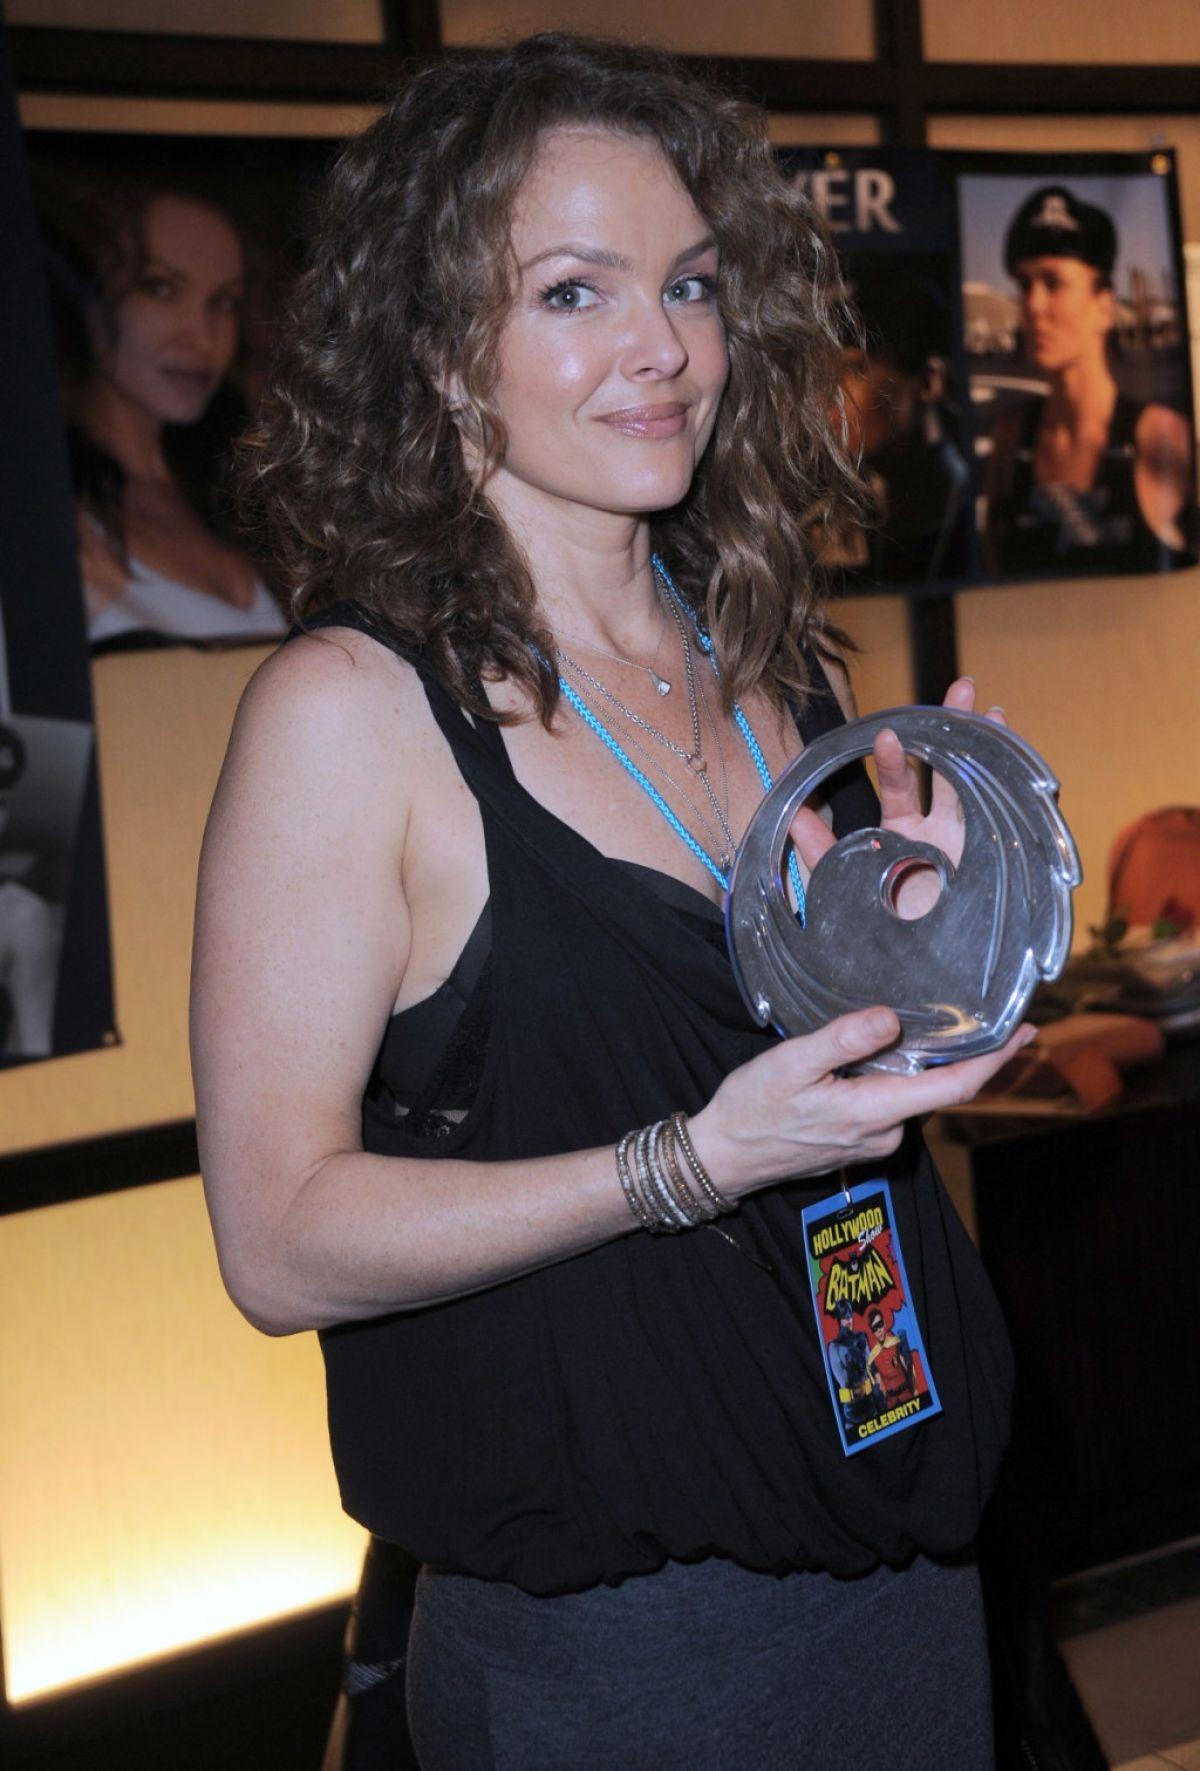 DINA MEYER at The Hollywood Show